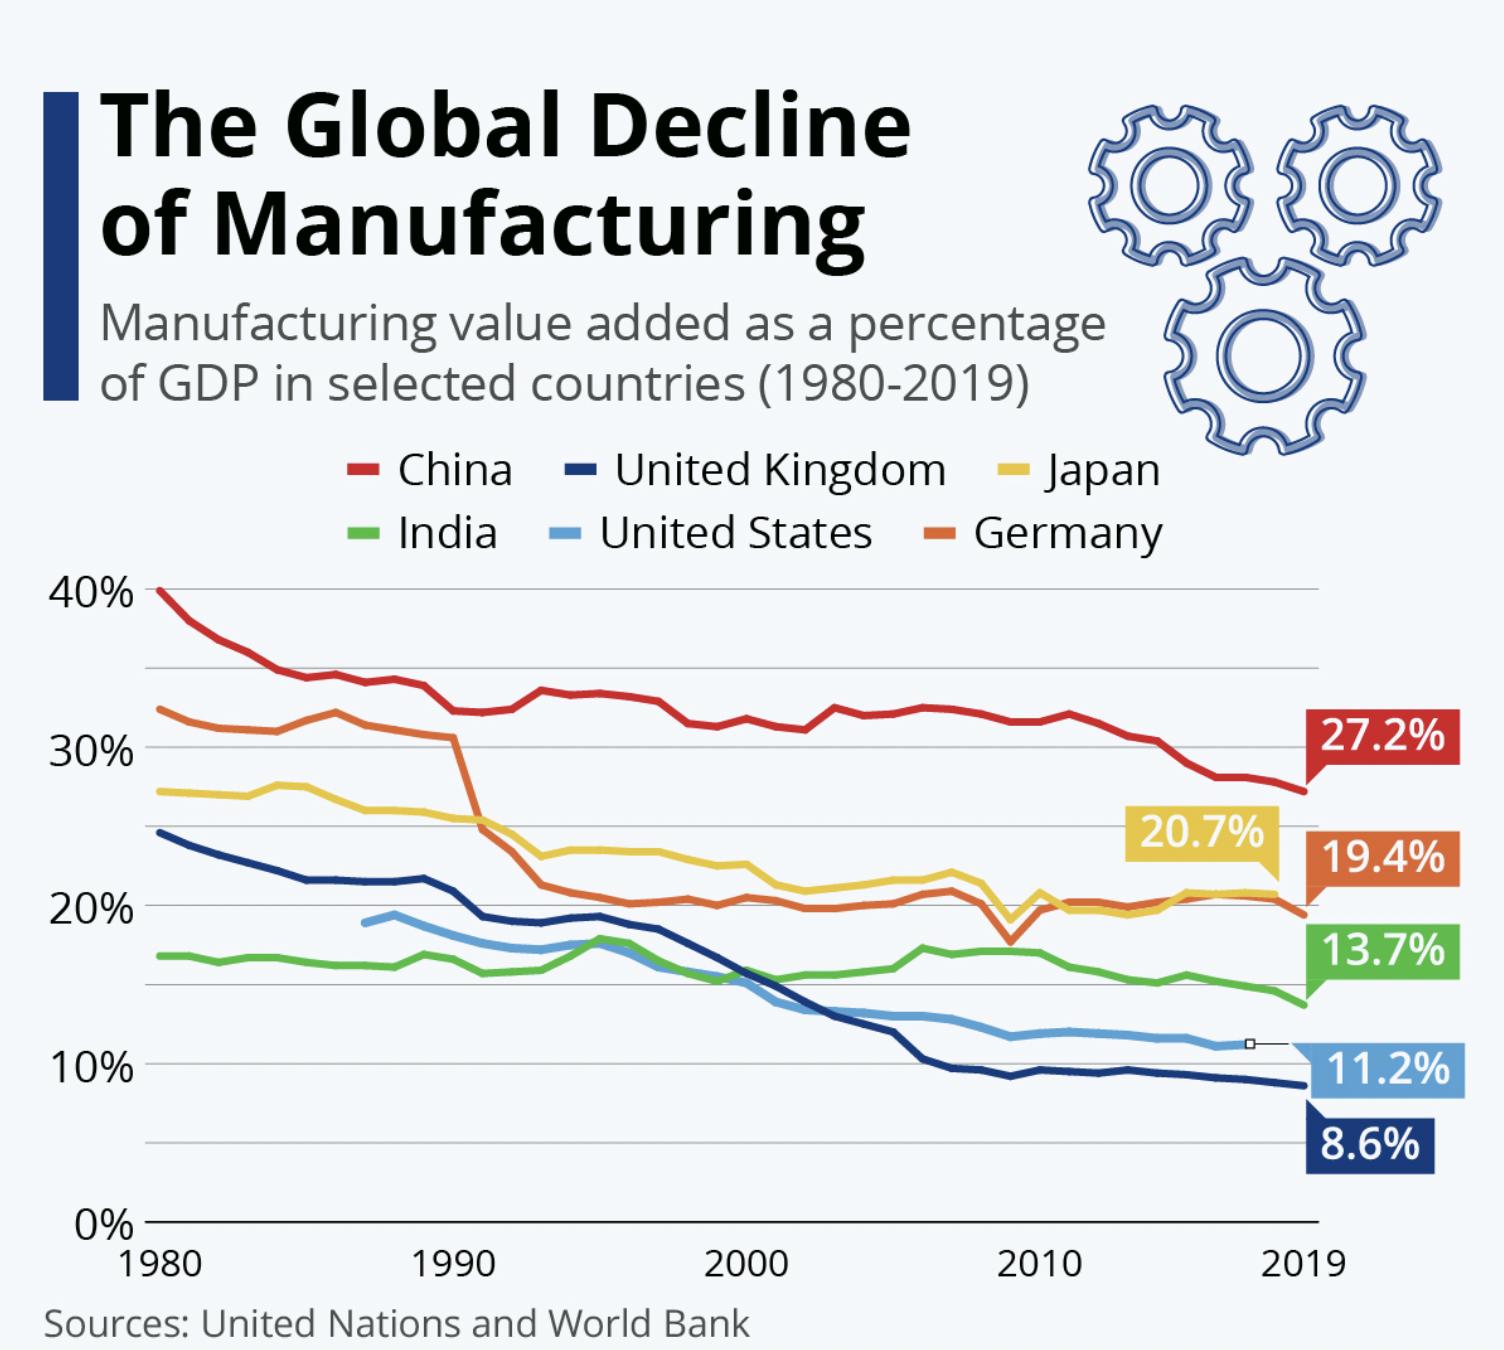 The Global Decline